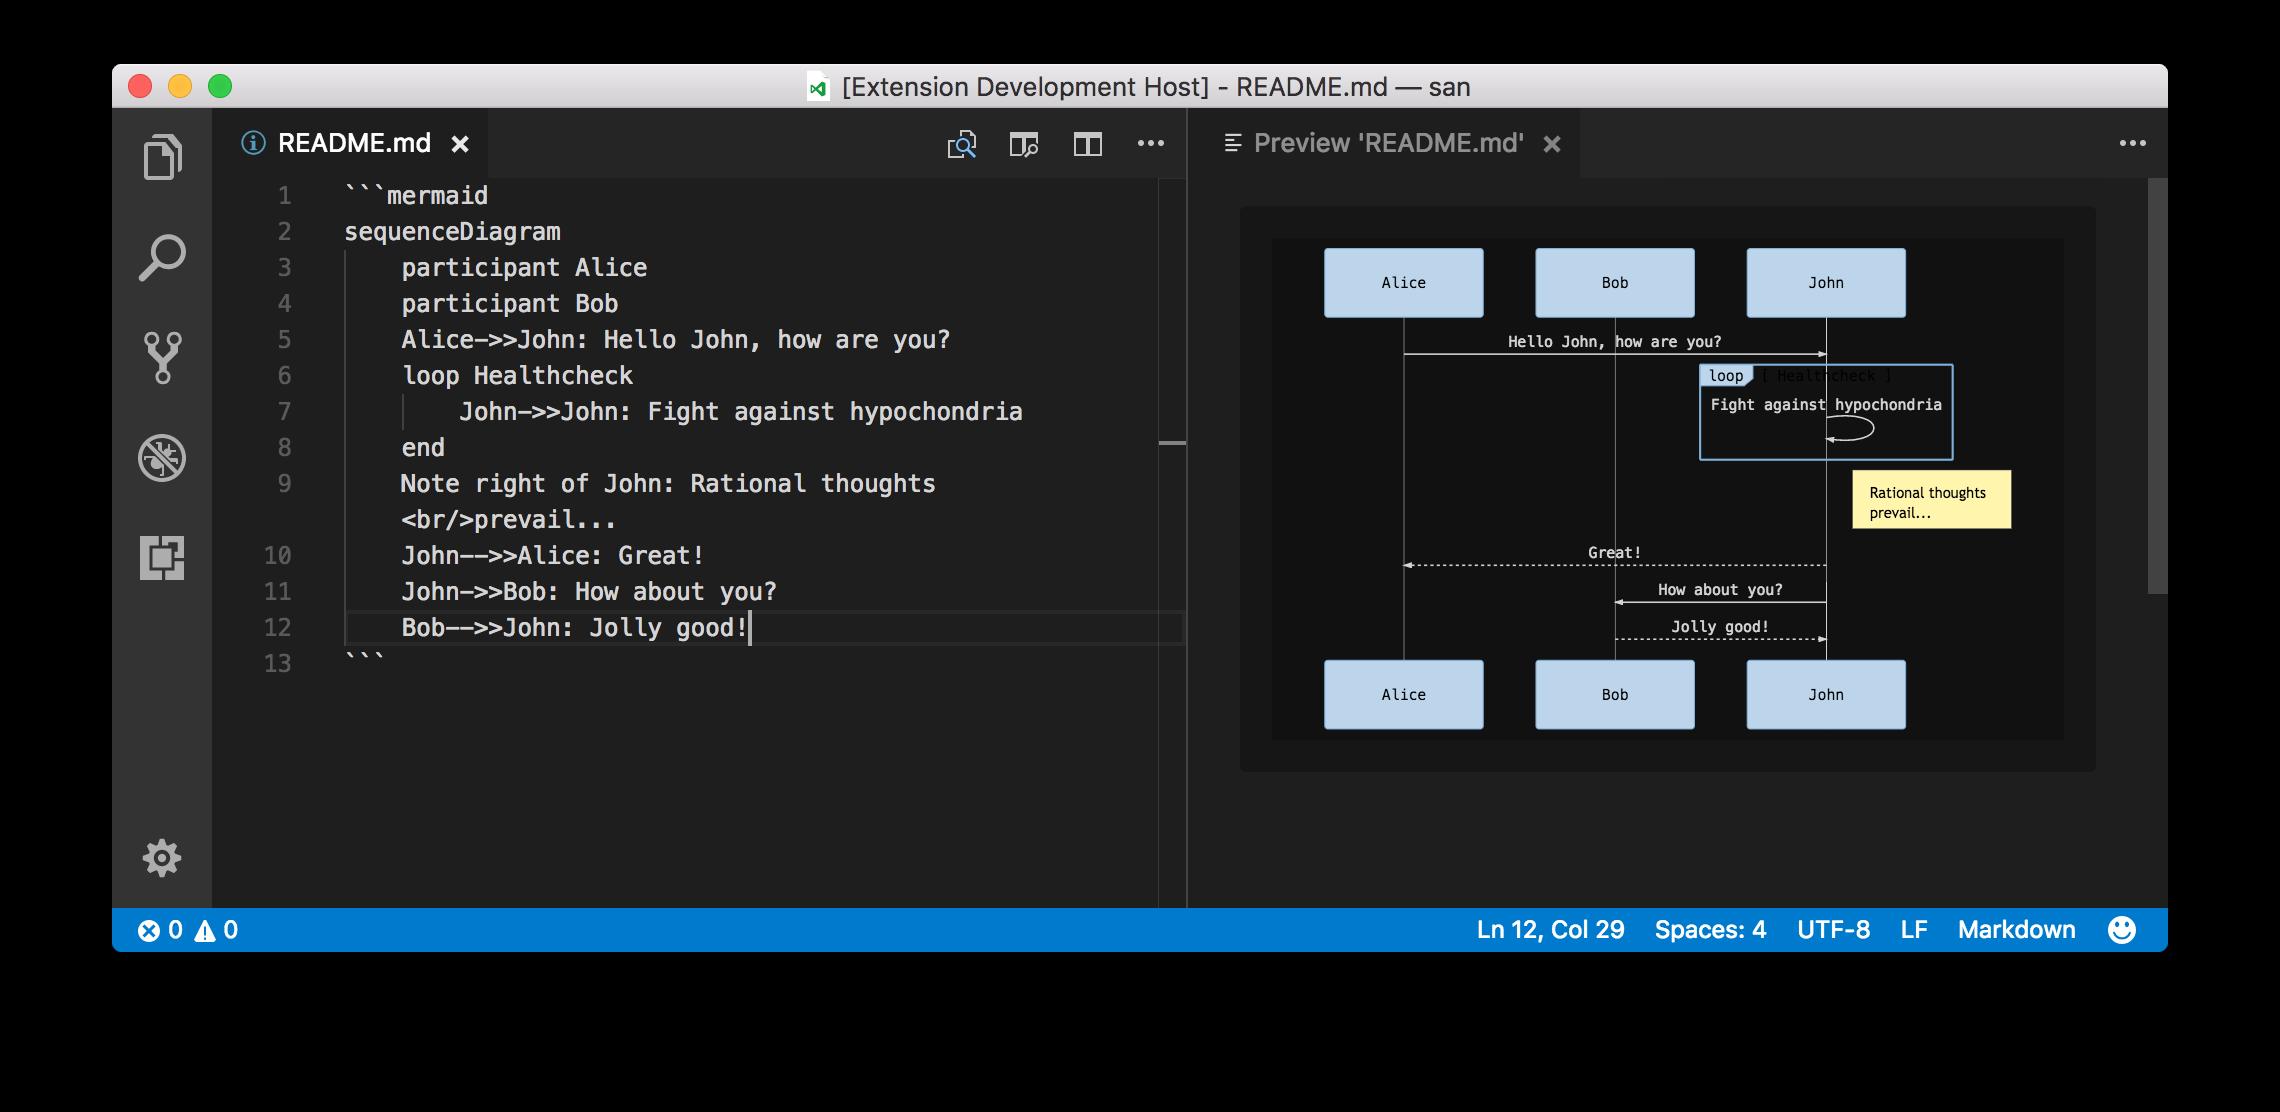 A mermaid diagram in VS Code's built-in markdown preview